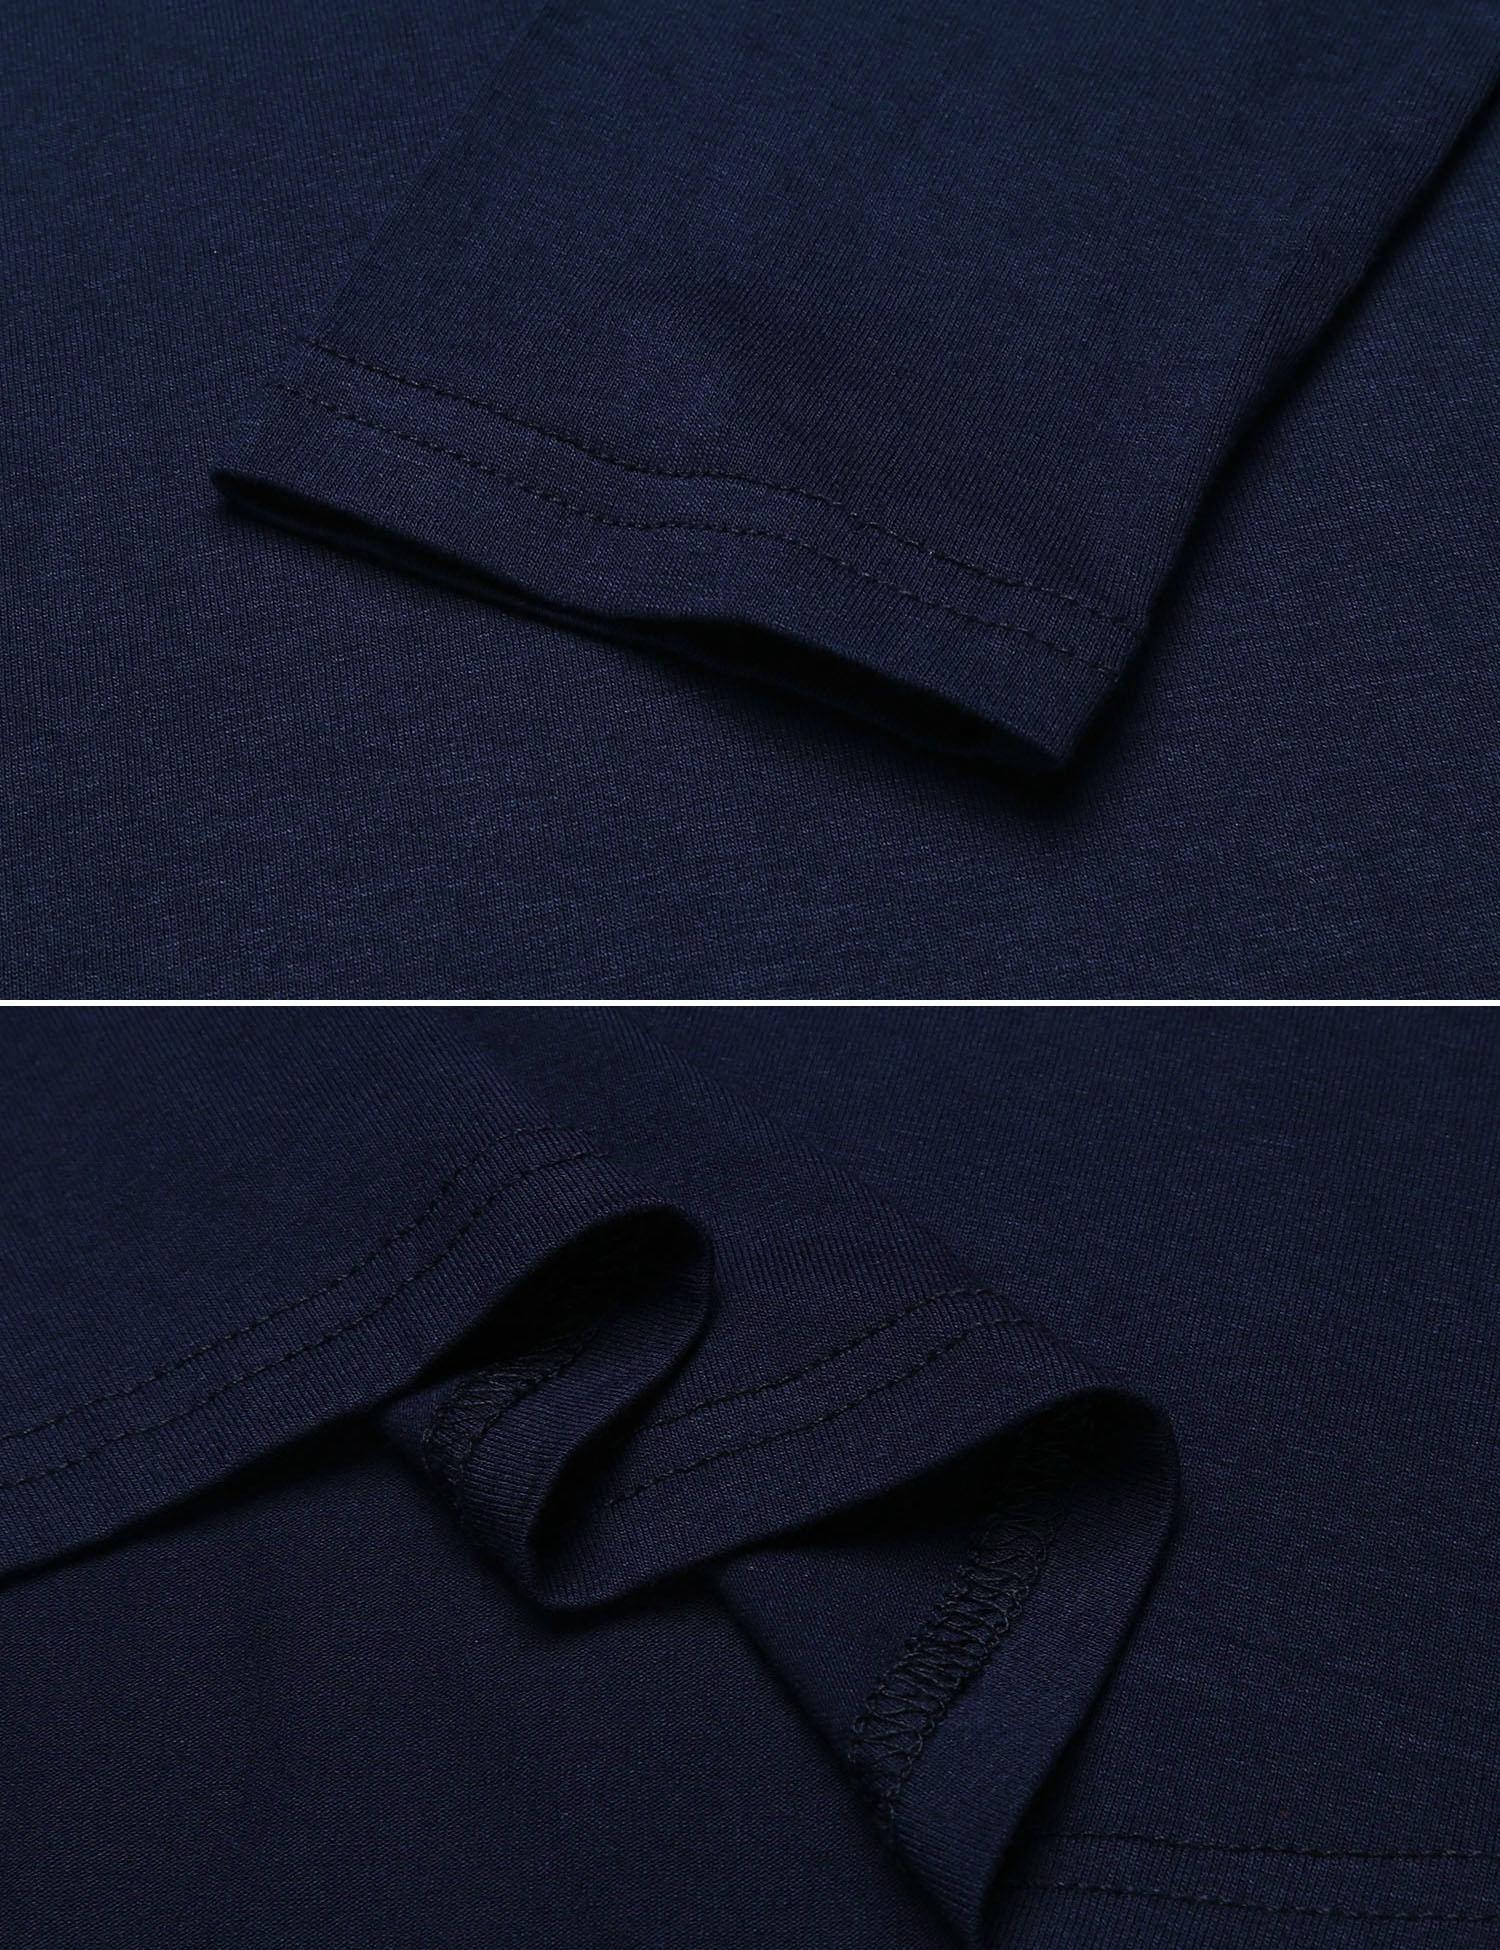 Misakia Women's Summer Cold Shoulder Tunic Top Swing T-Shirt Loose Dress (Navy Blue XL) by Misakia (Image #6)